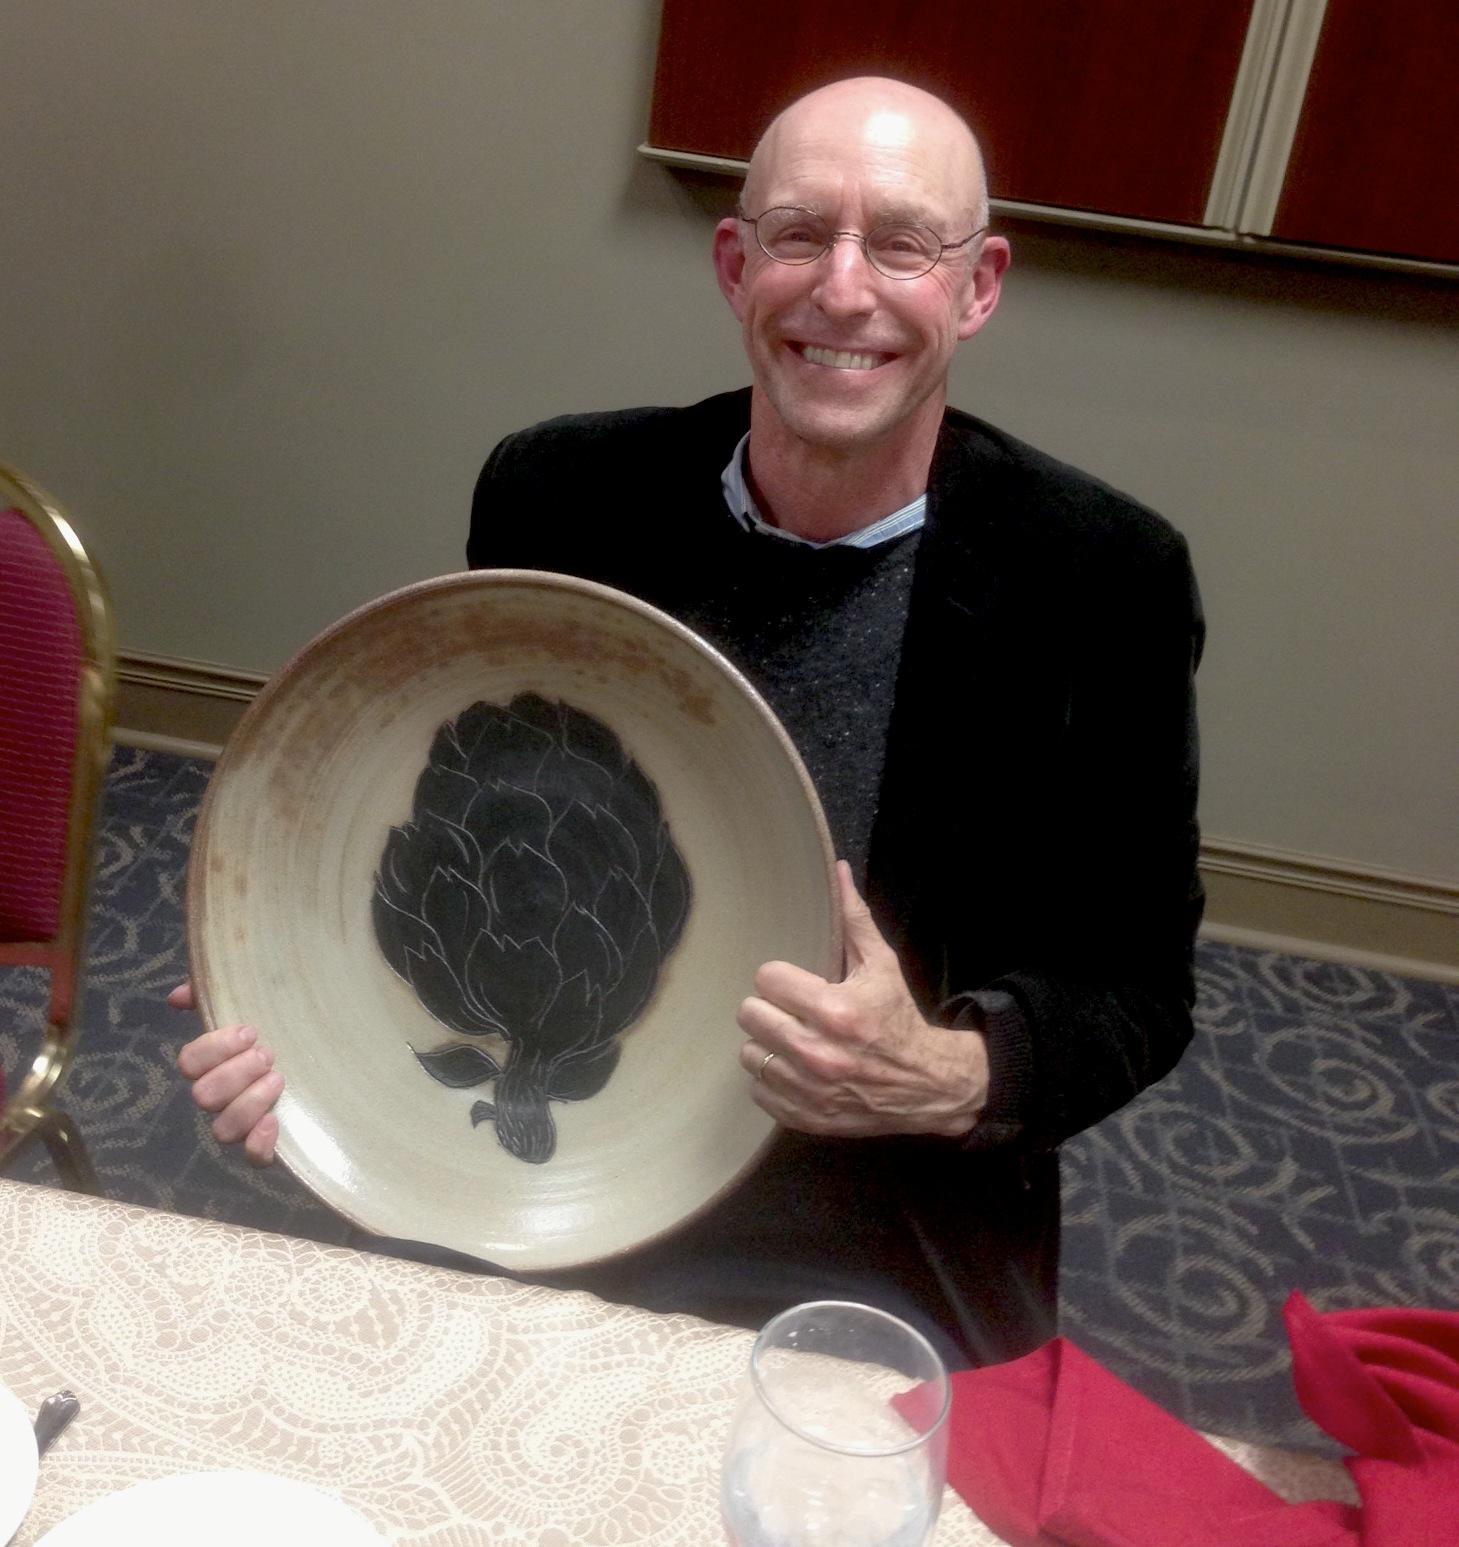 Michael Pollan receiving the Gift of Food at University of Dayton